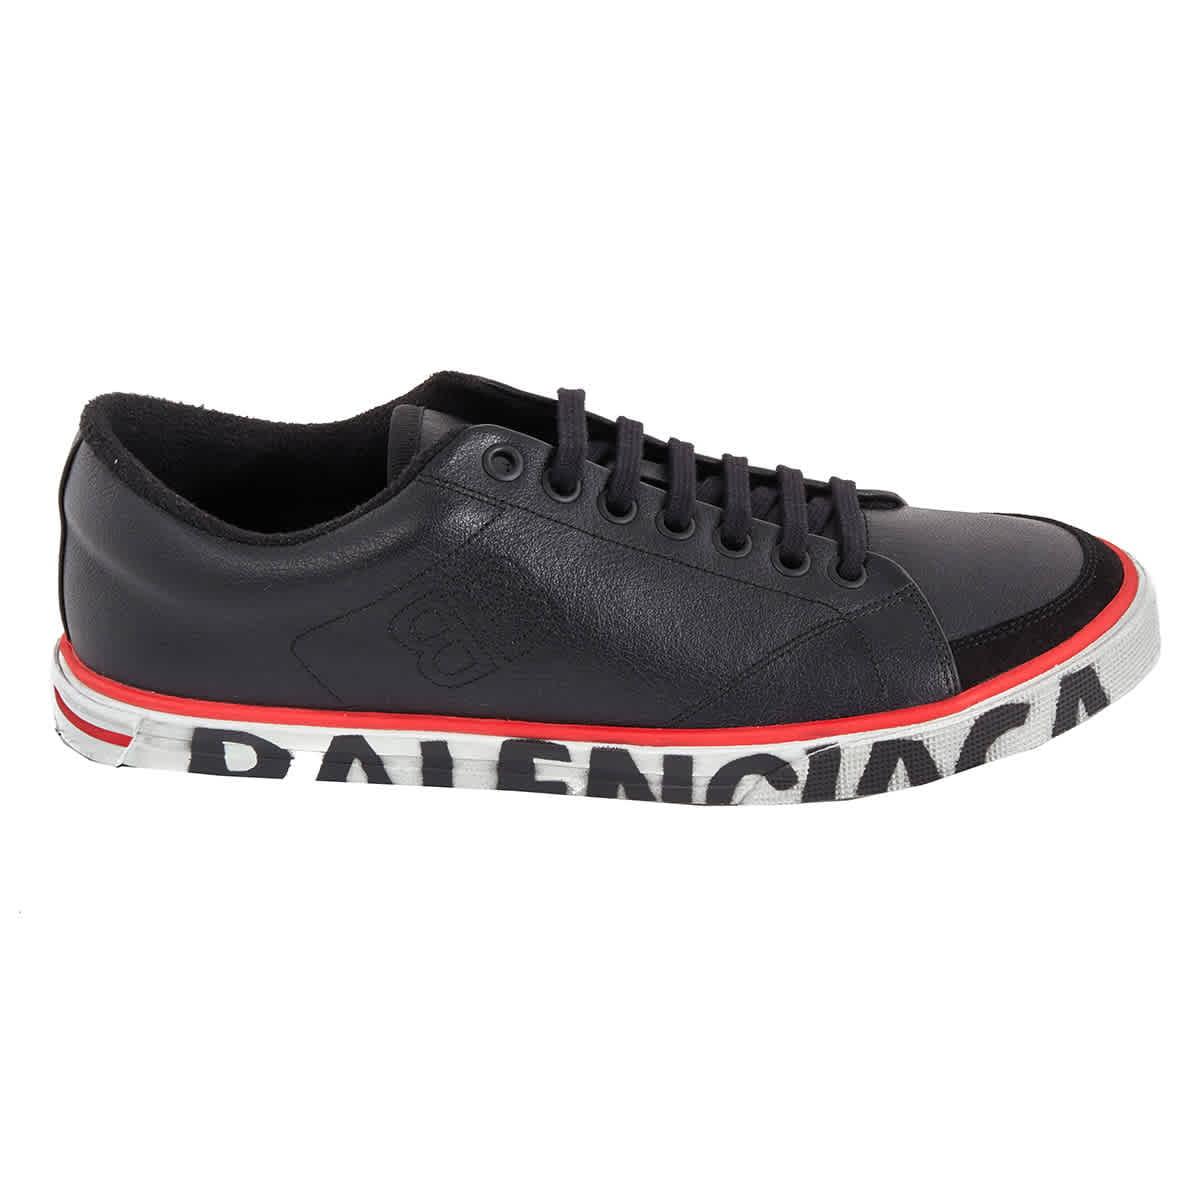 Black Balenciaga Clothing - Walmart.com